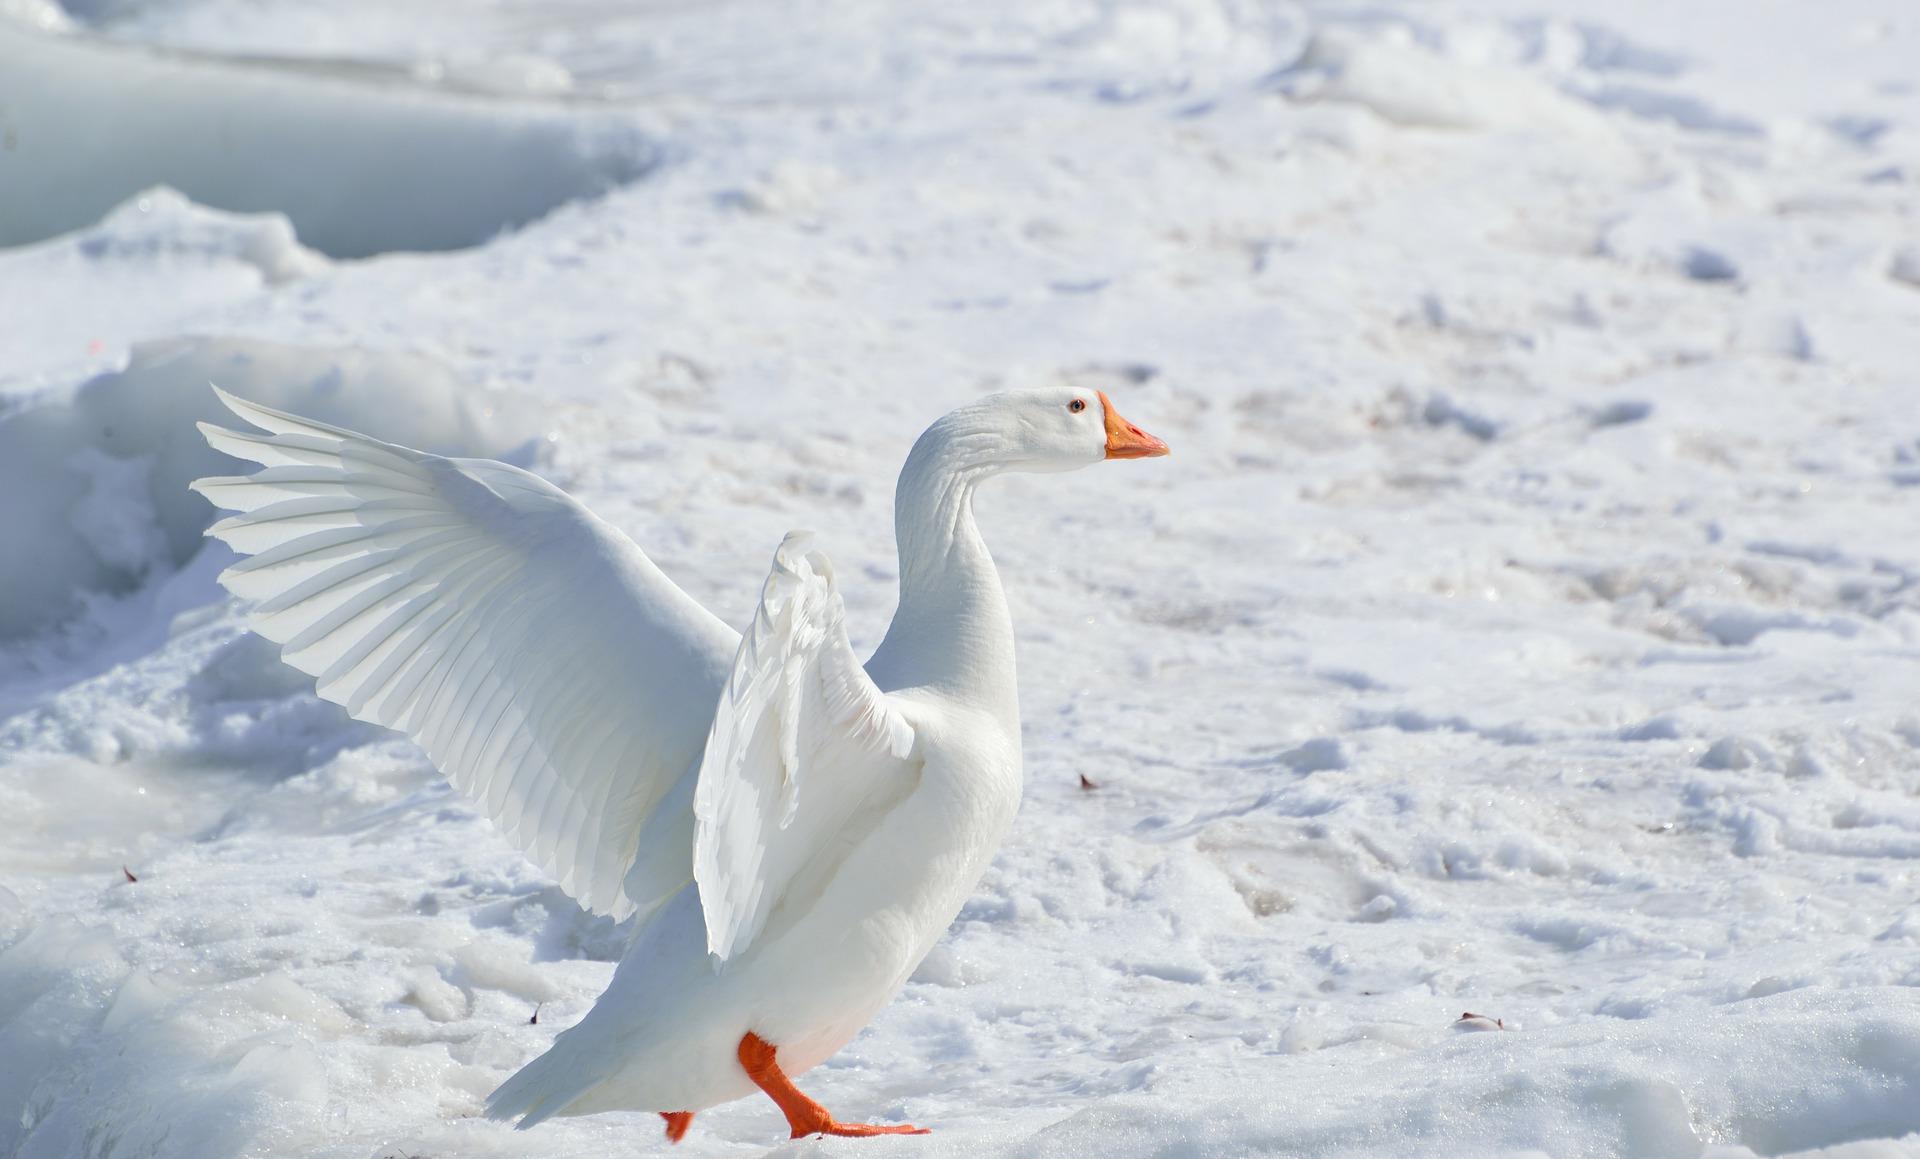 greater-snow-goose-284211_1920.jpg